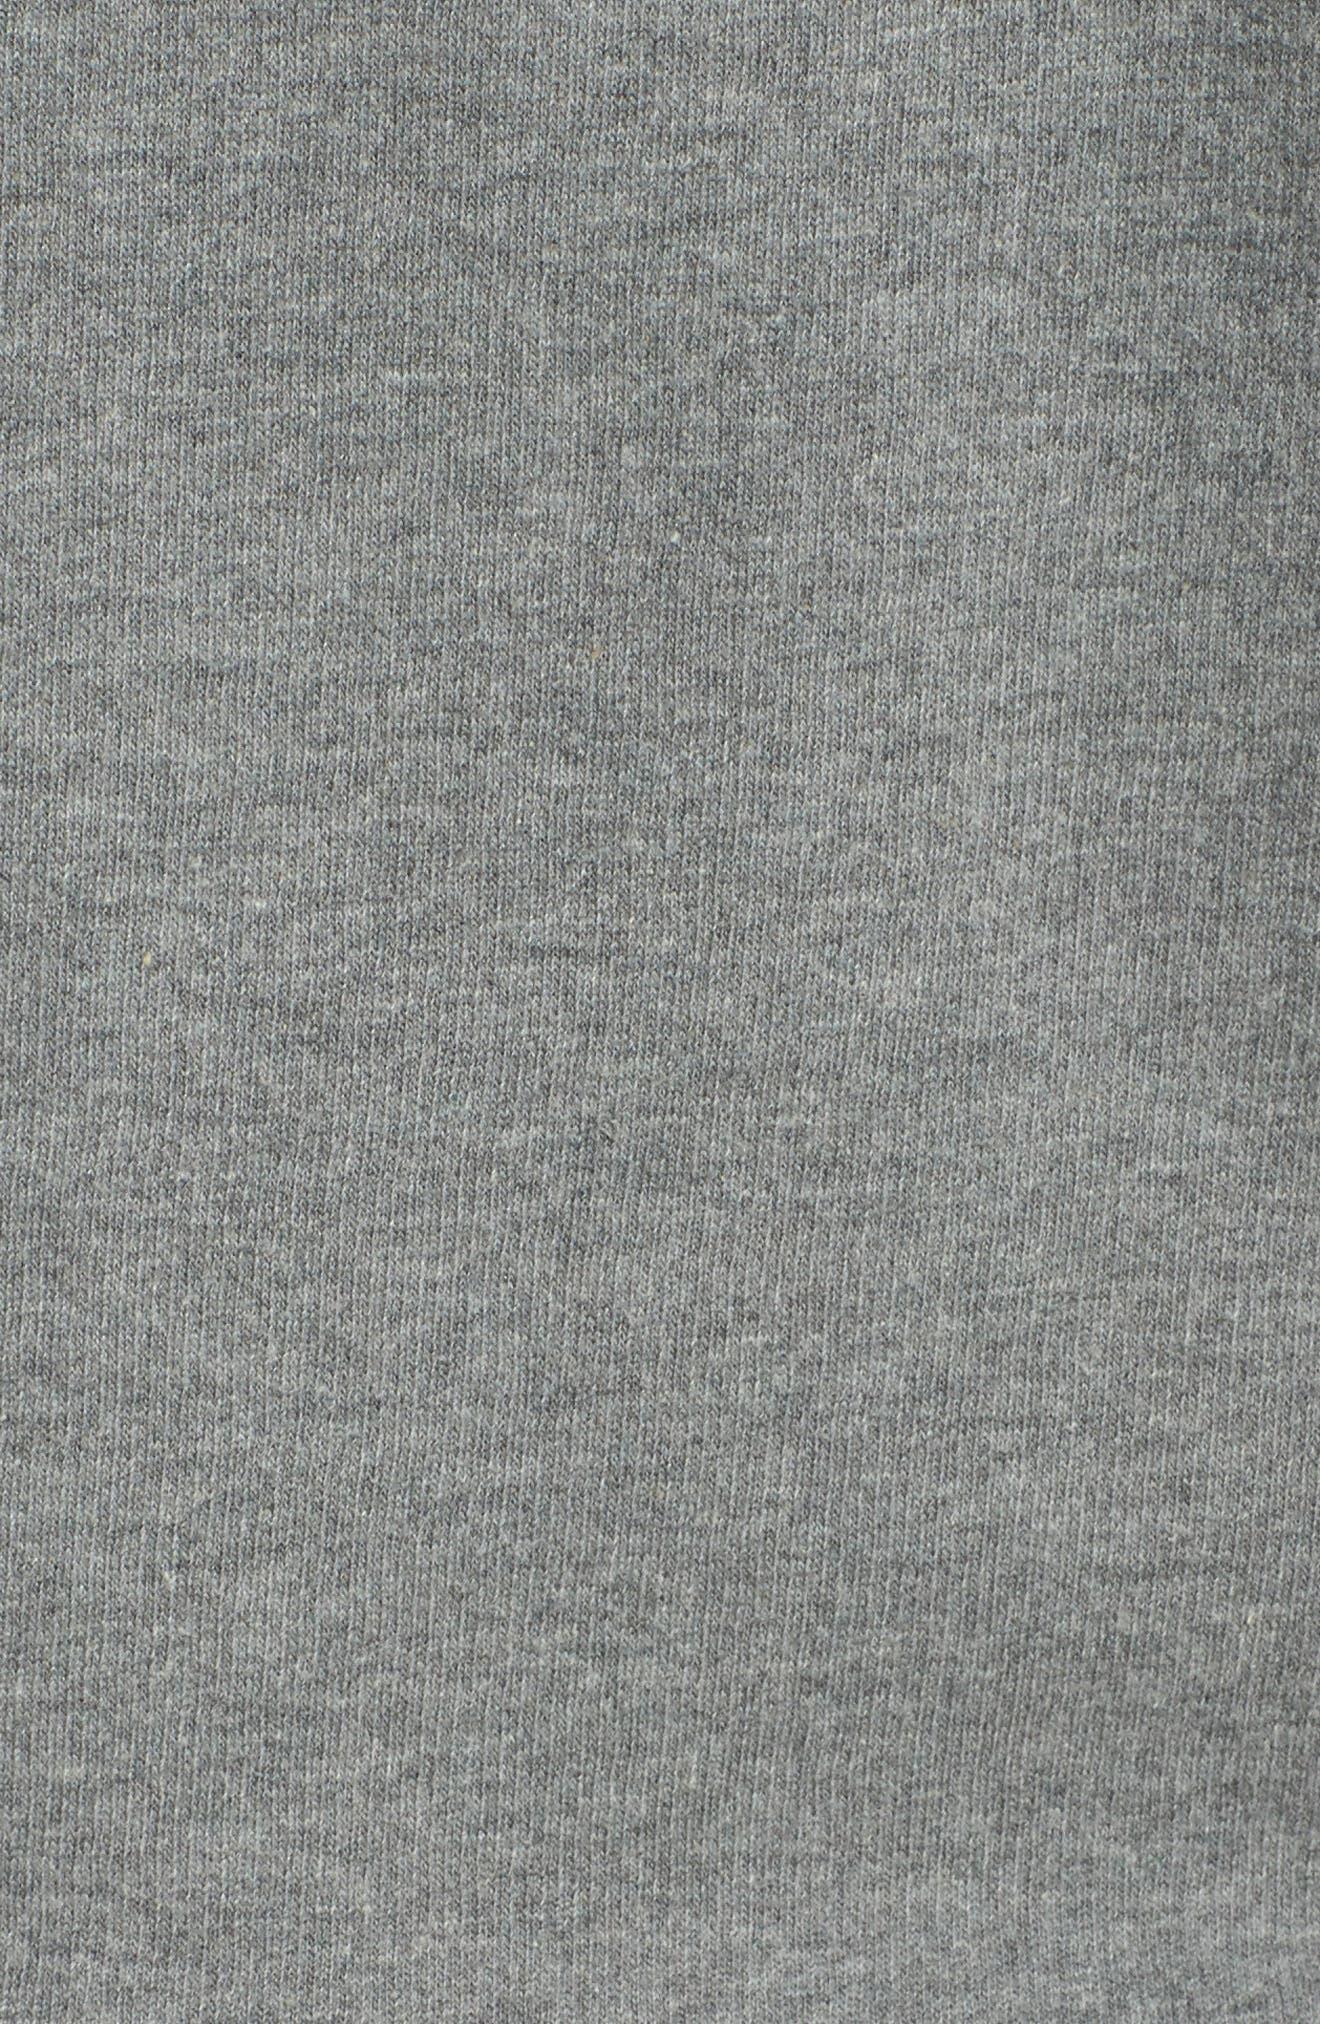 Fries Before Guys Sweatshirt,                             Alternate thumbnail 5, color,                             020